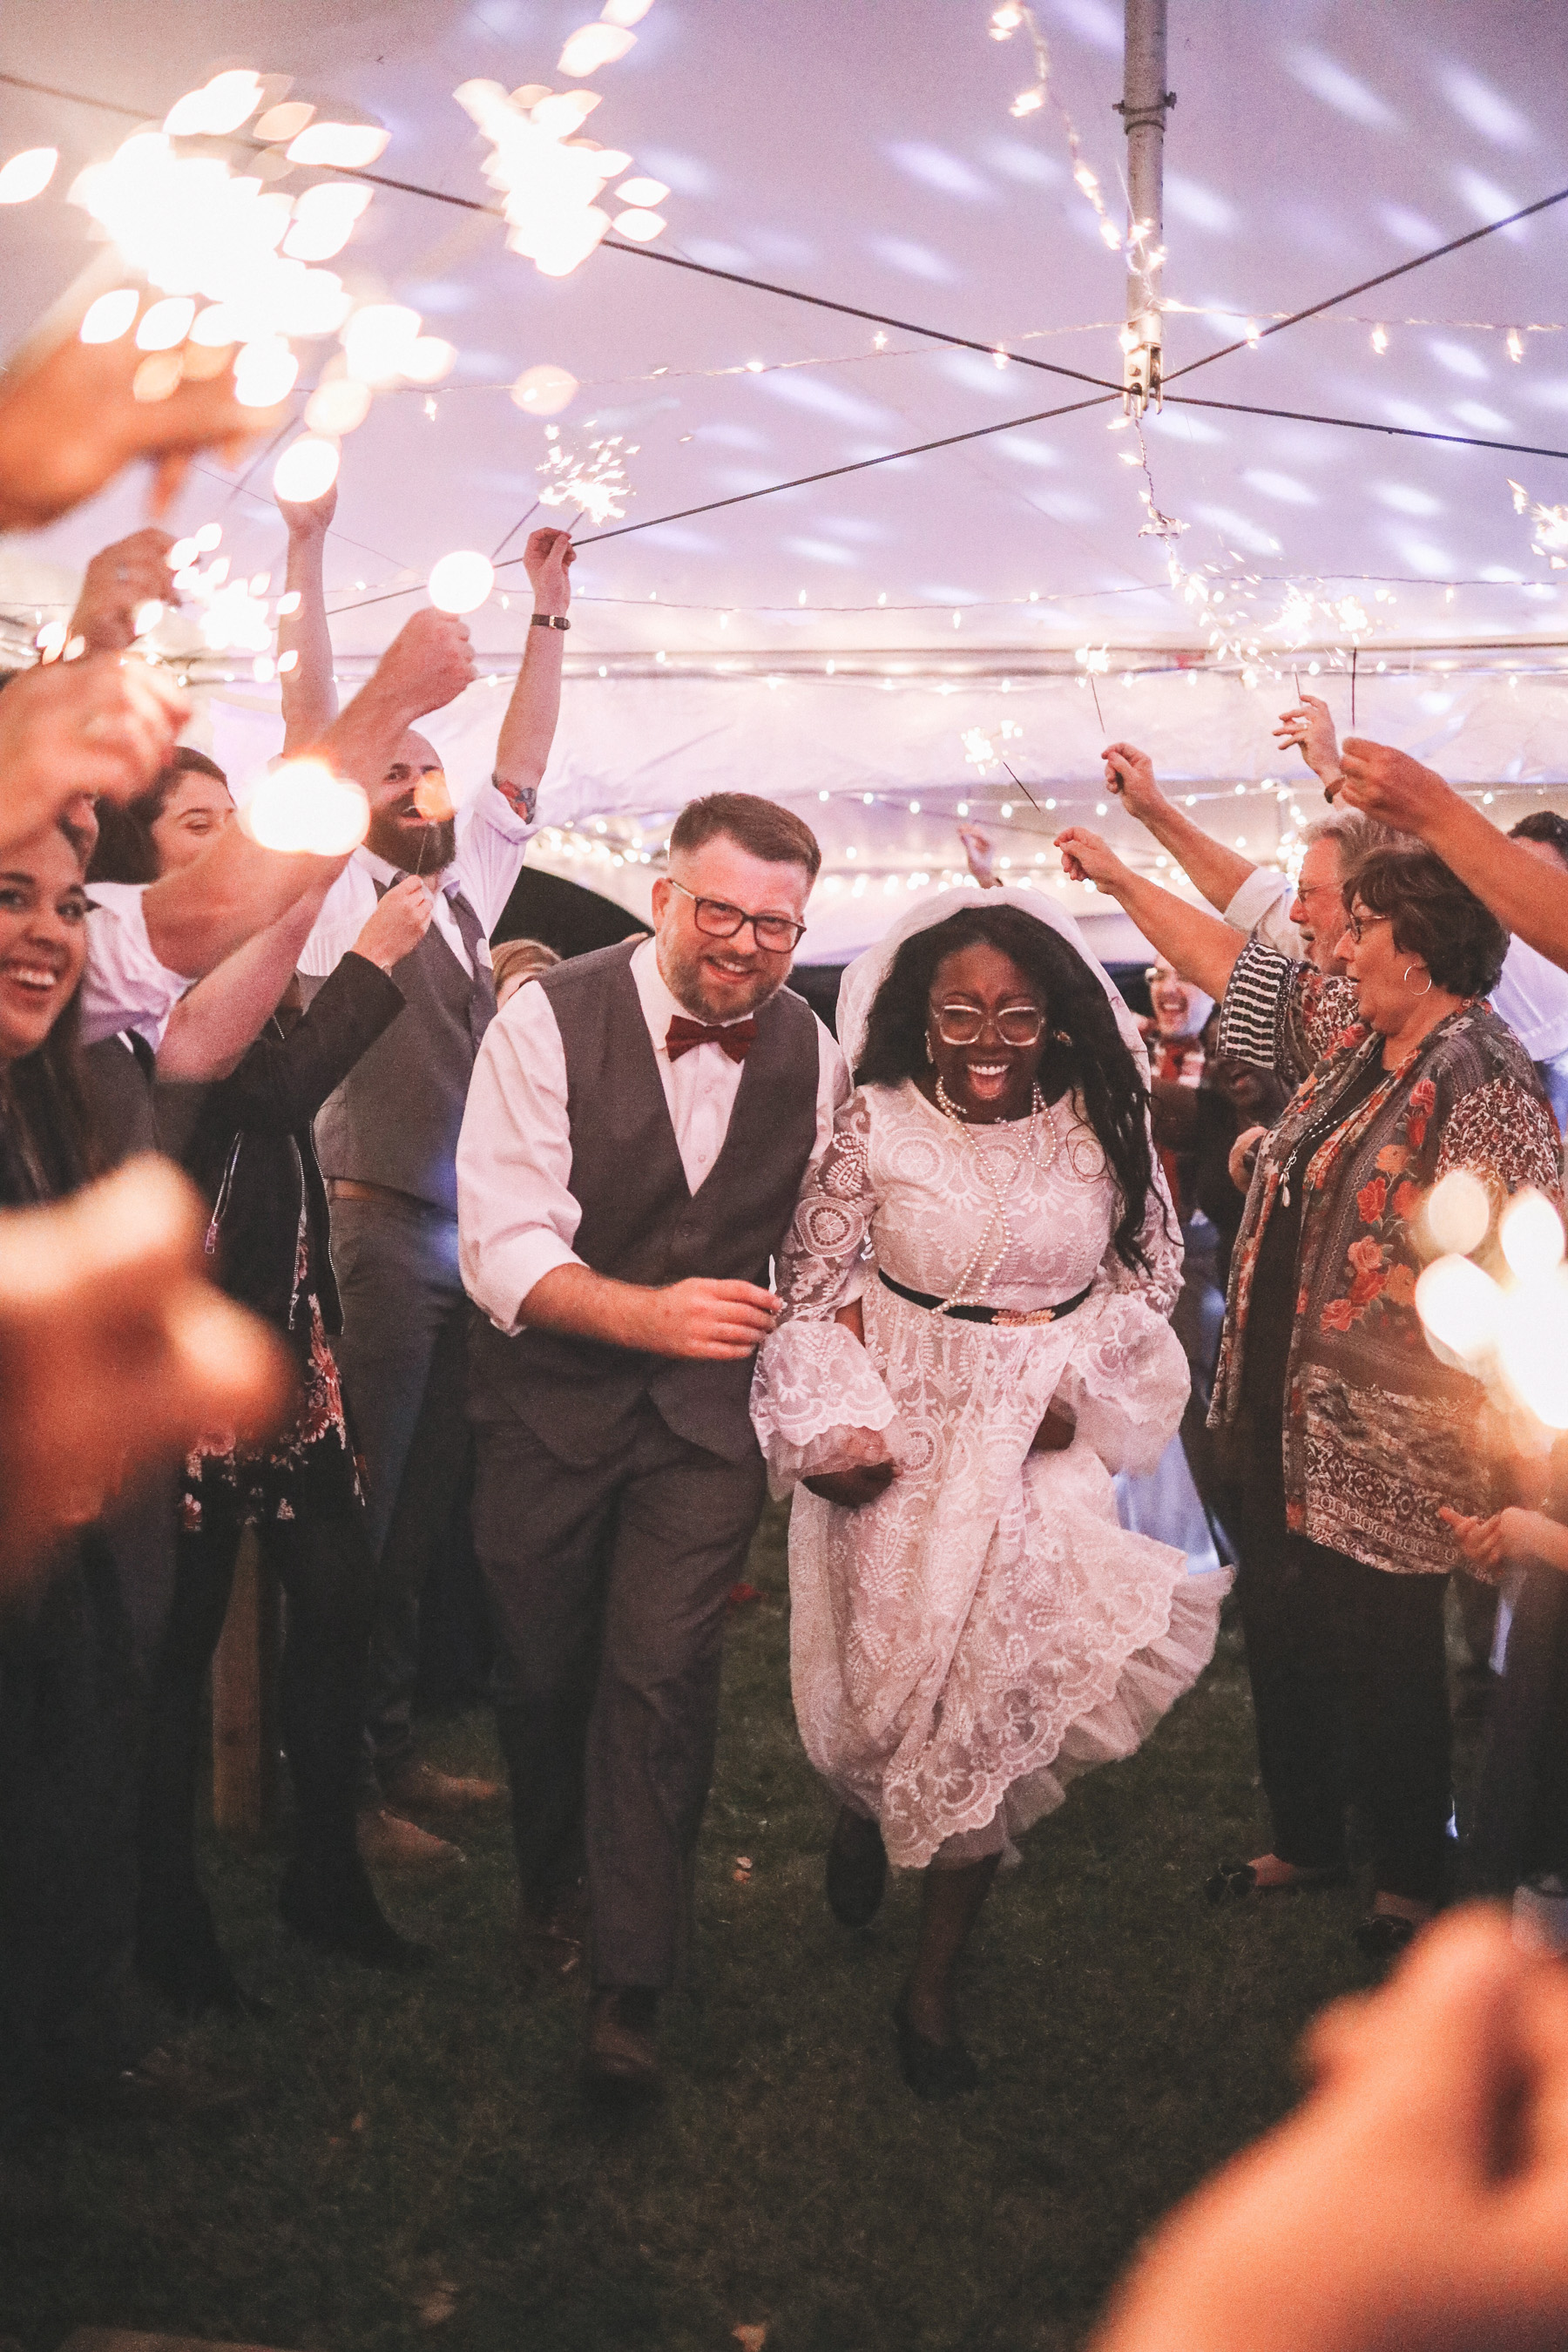 wedding snapshots | Charlie and Shirleys Wedding